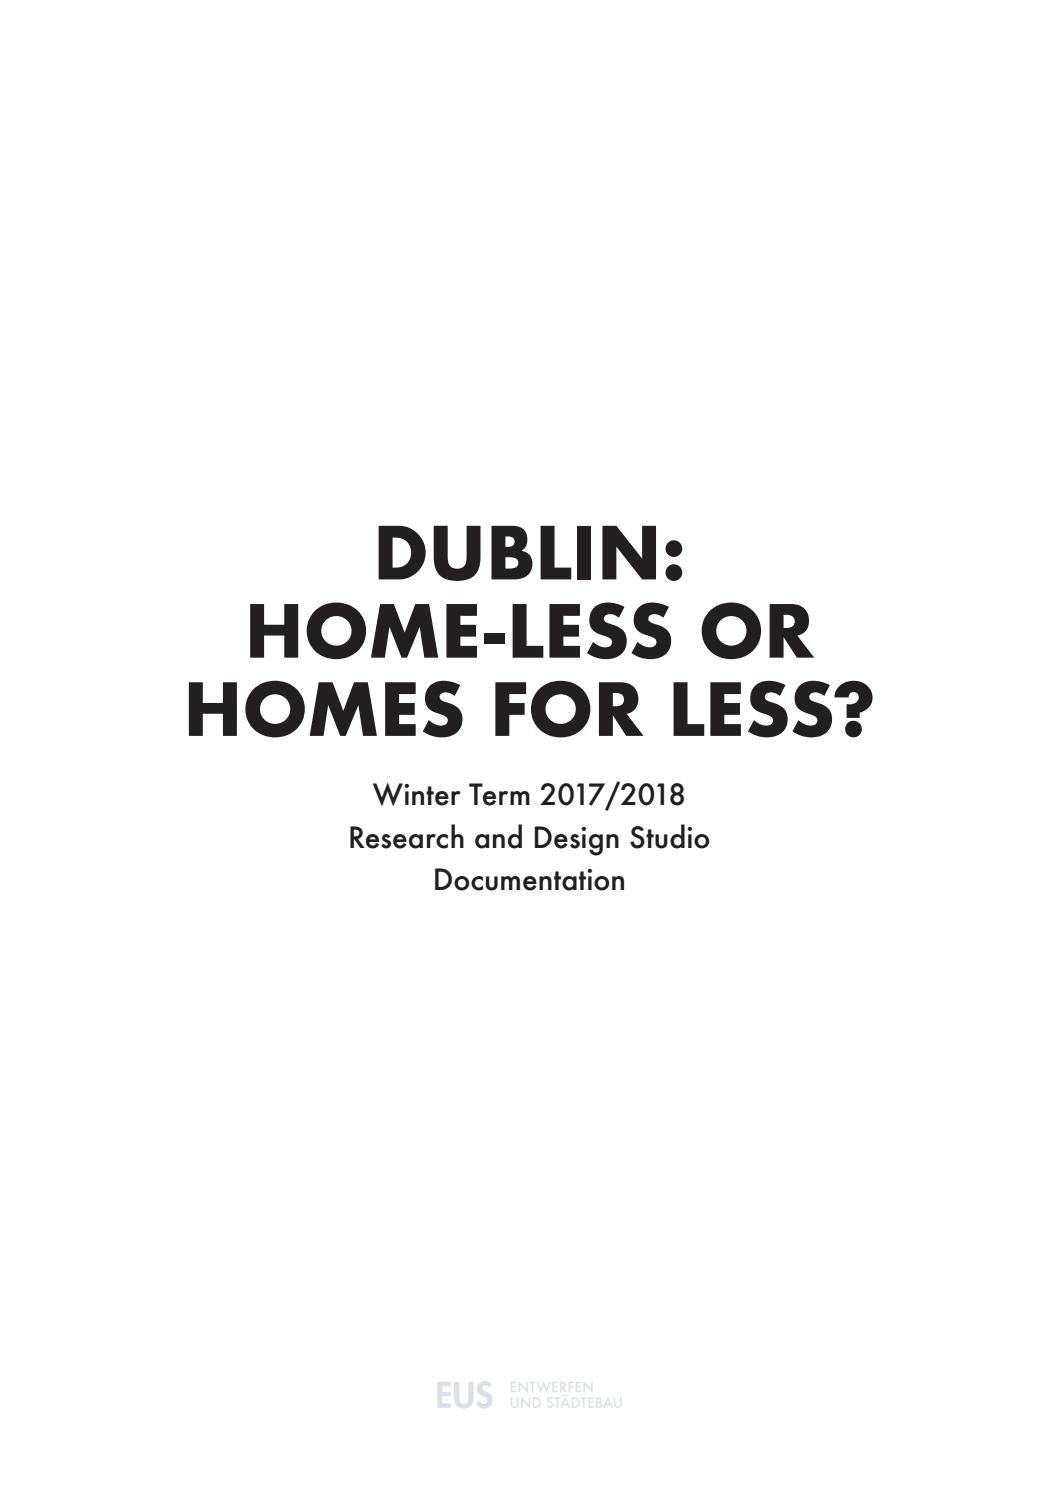 Dublin: Home-less or Homes for Less? by Entwerfen und Städtebau_TU ...